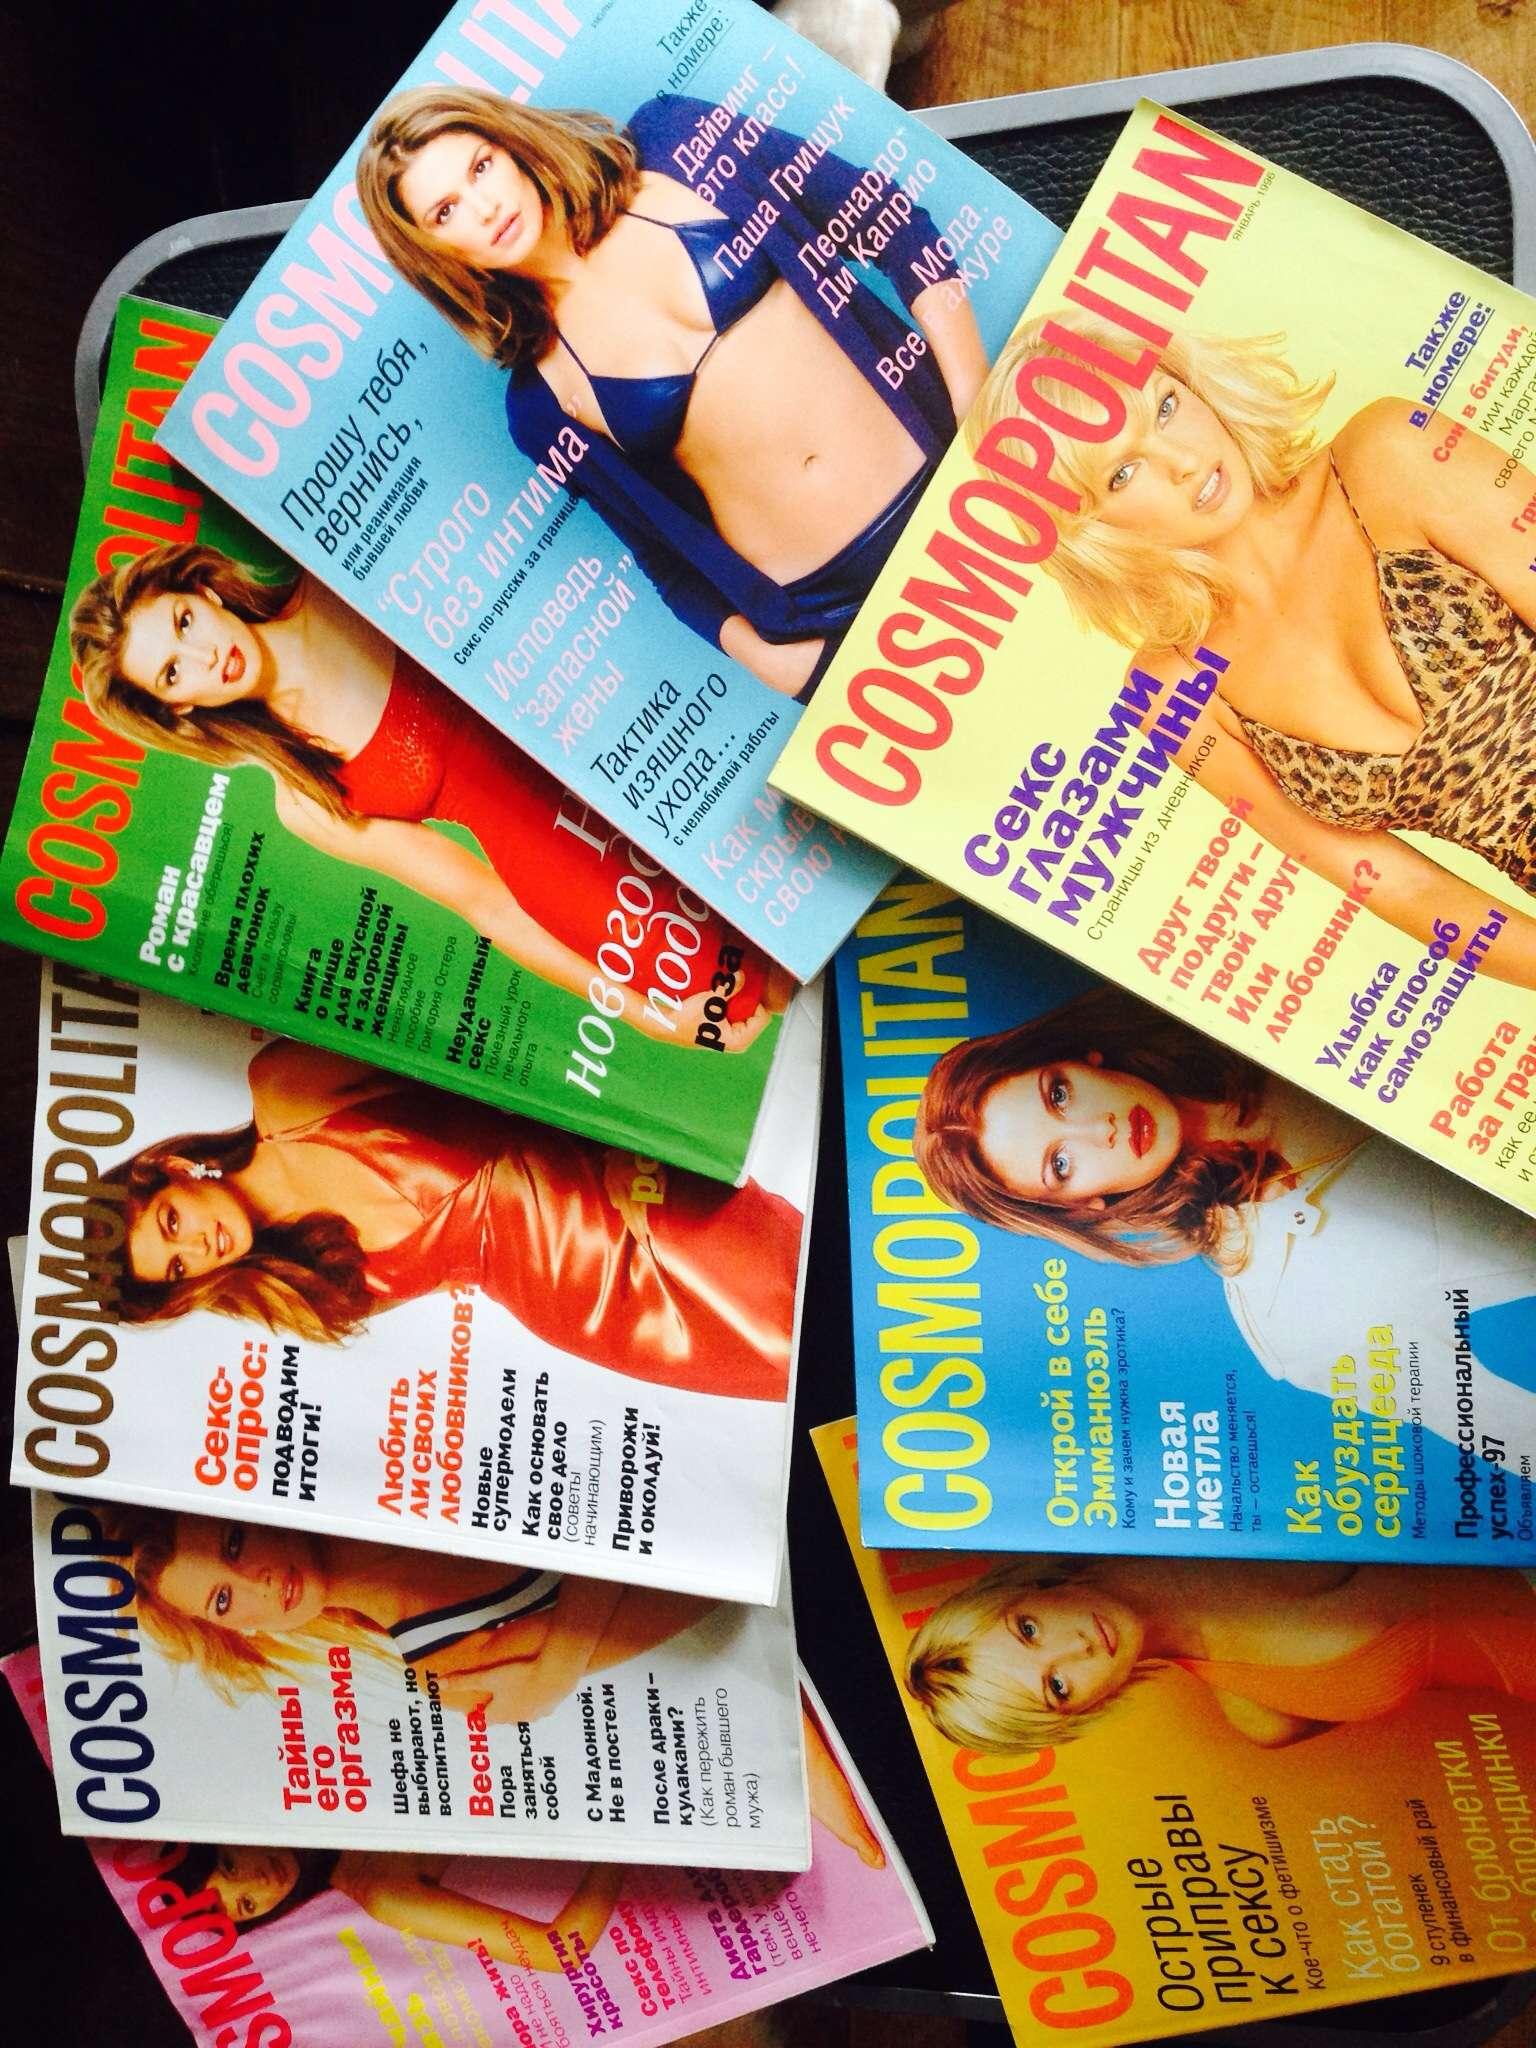 старые журналы мод 70 г с выкройками